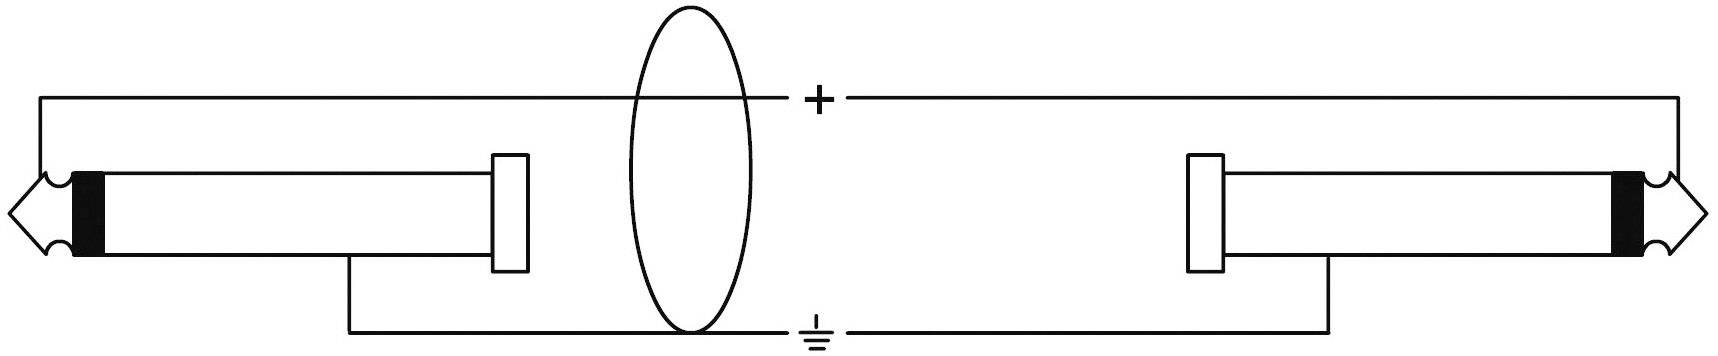 Kábel Cordial CPL 5 PP, [1x jack zástrčka 6,35 mm - 1x jack zástrčka 6,35 mm], 5 m, čierna